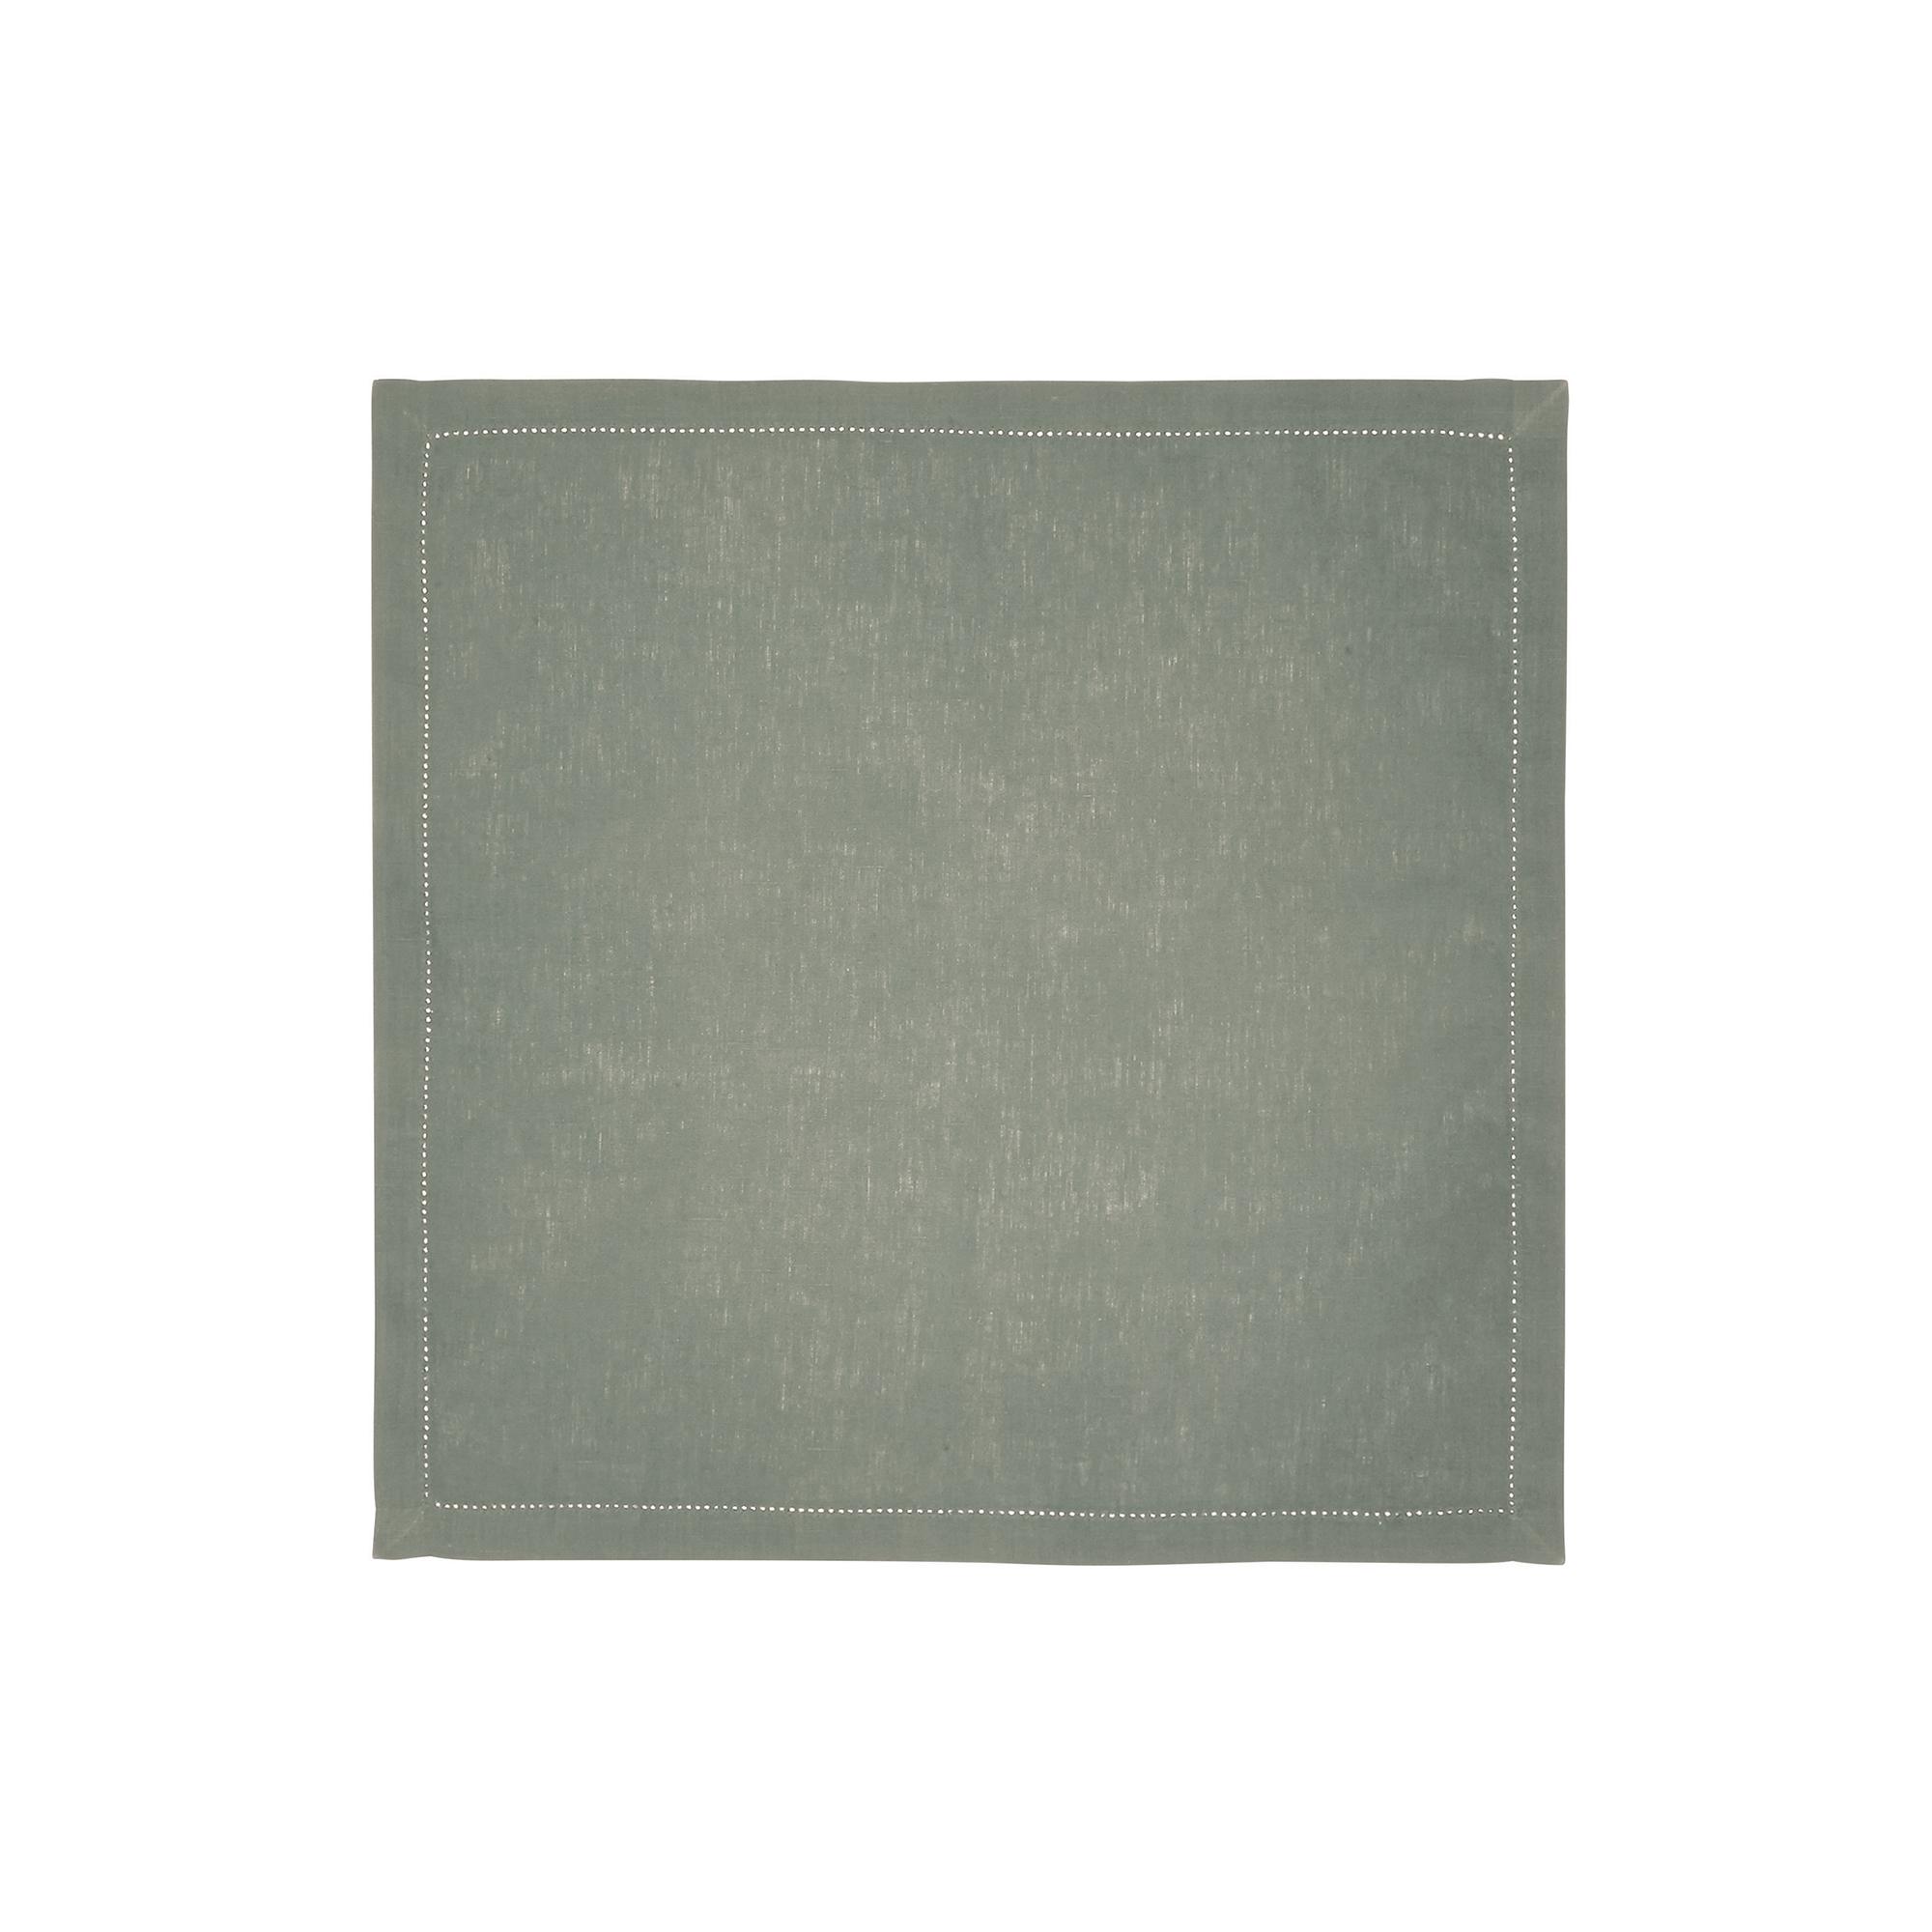 Serviette de table en lin vert 45x45